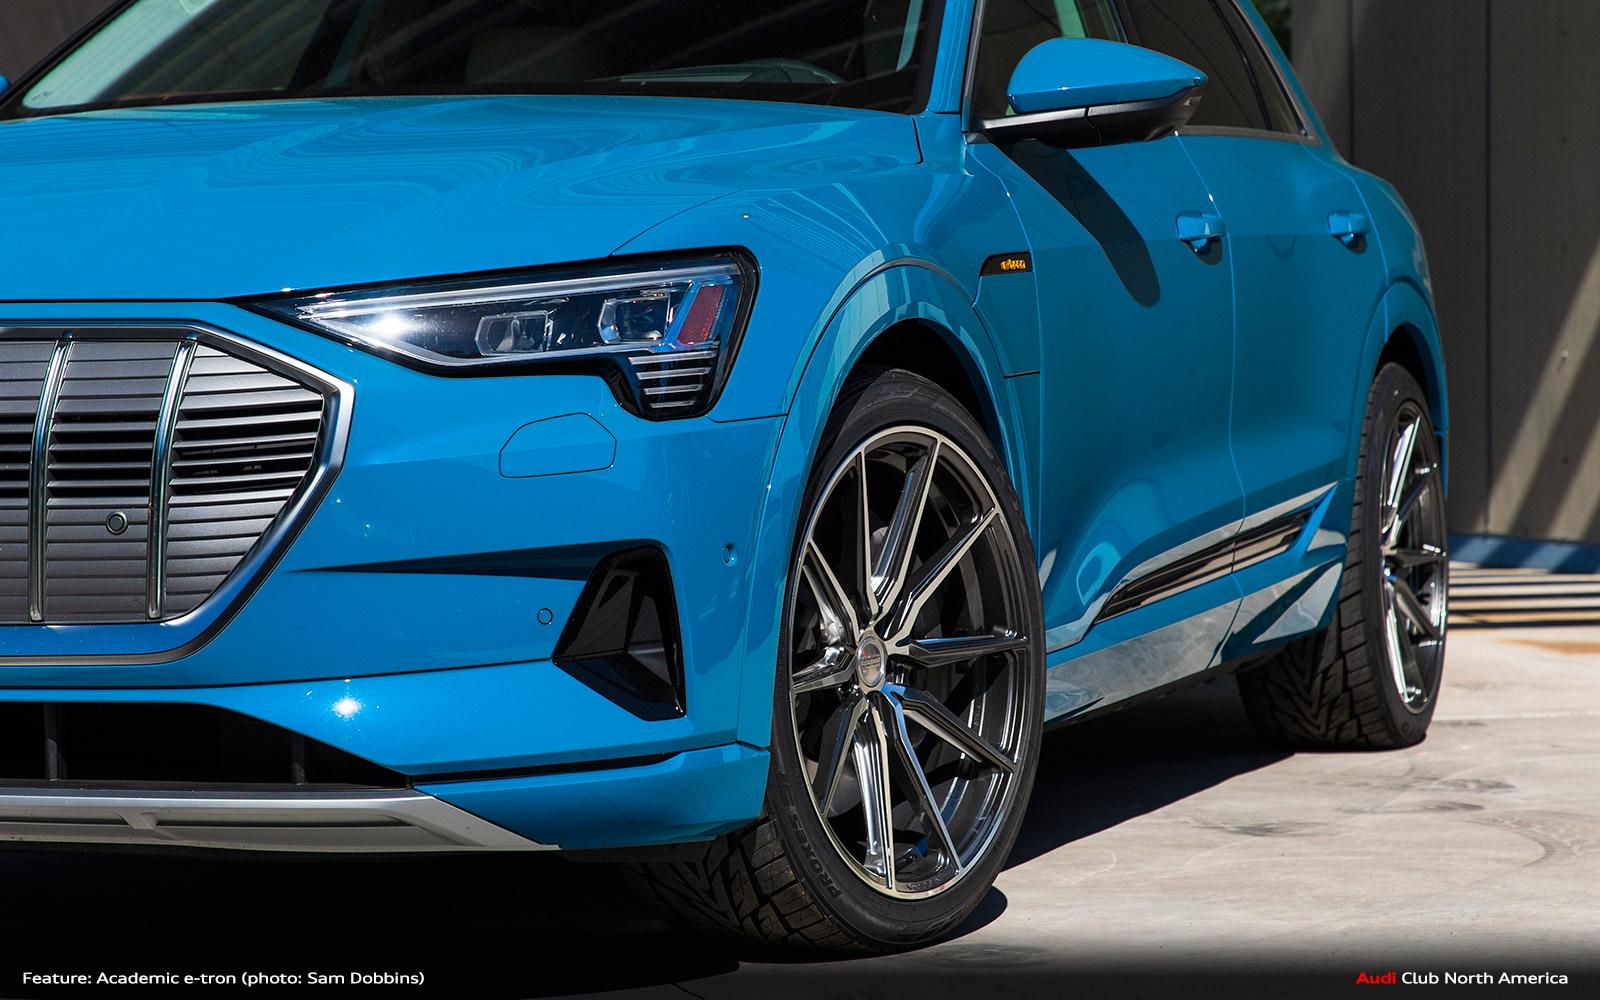 quattro Magazine: Feature Car: Academic e-tron